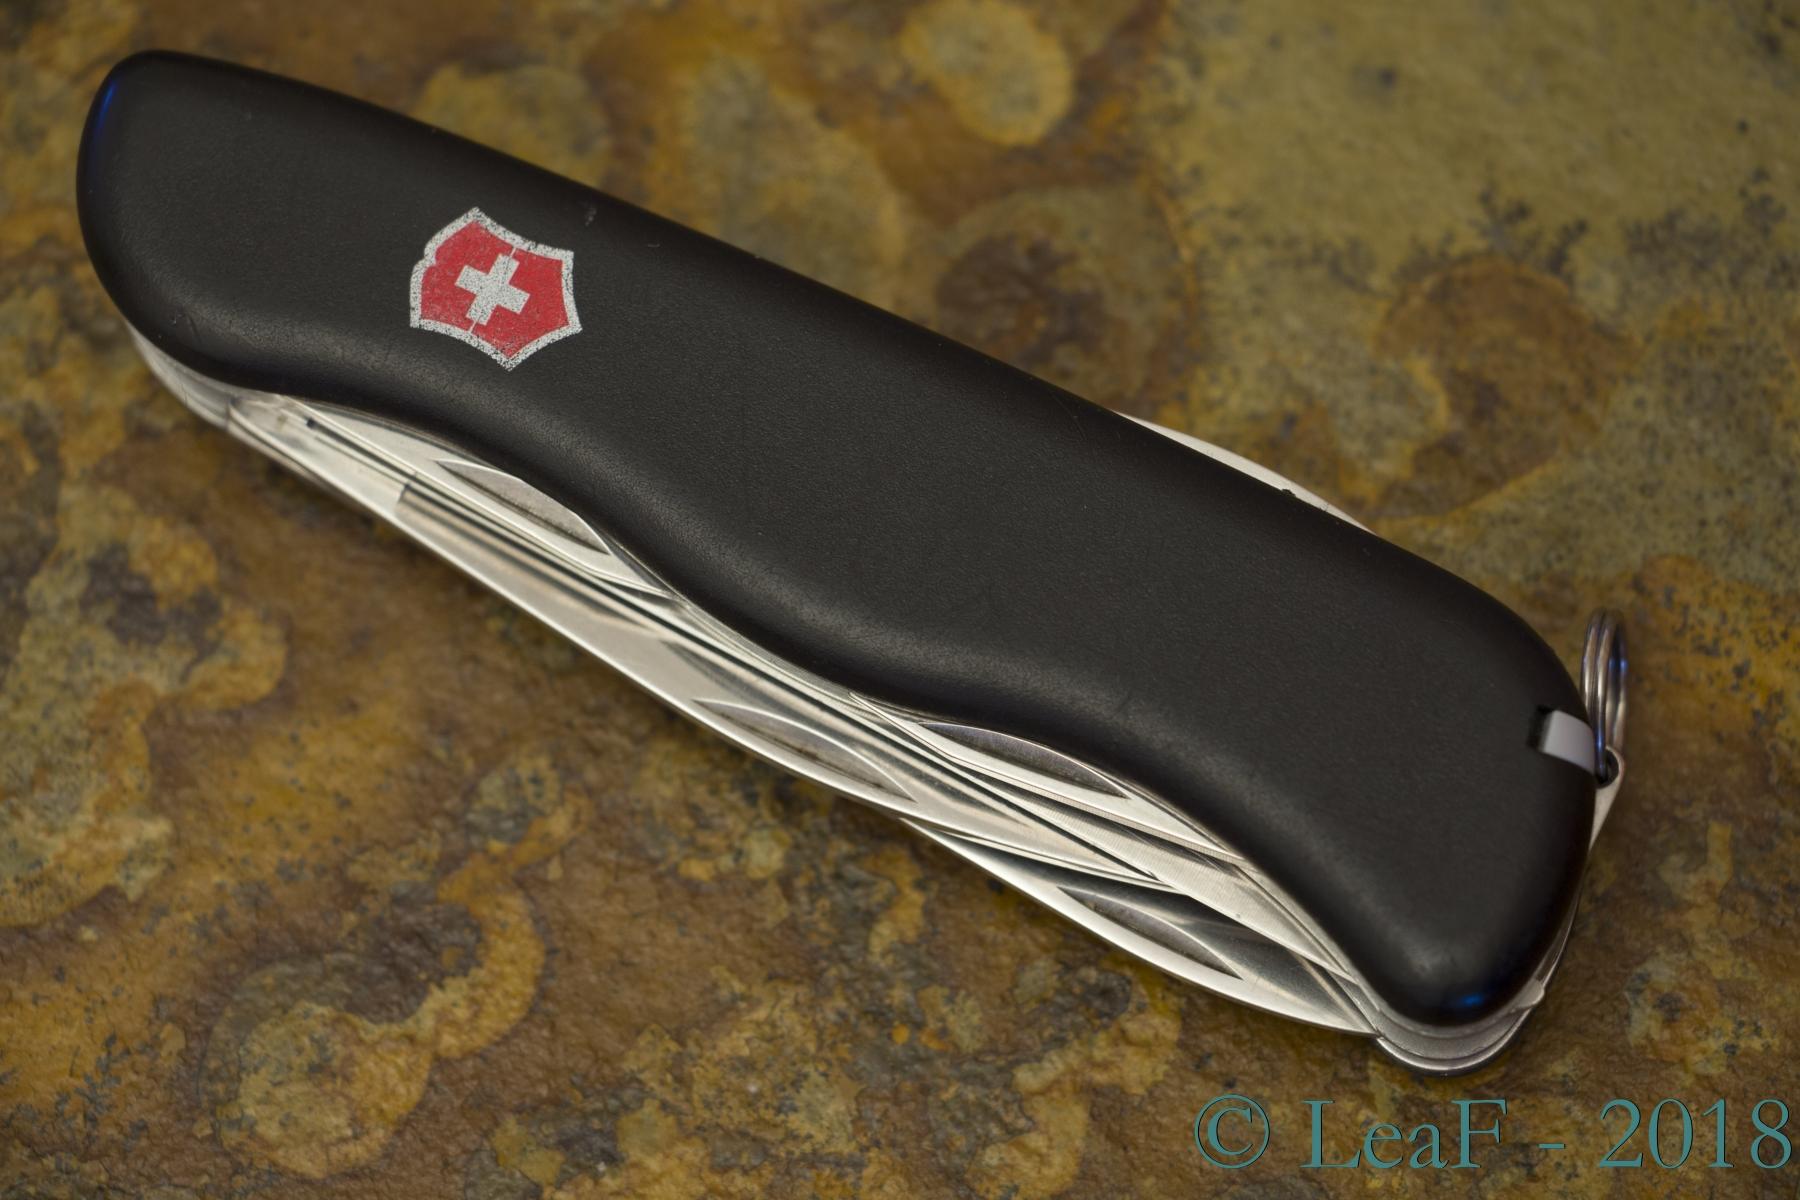 202 Fireman Slide Lock Leaf S Victorinox Knives Collection